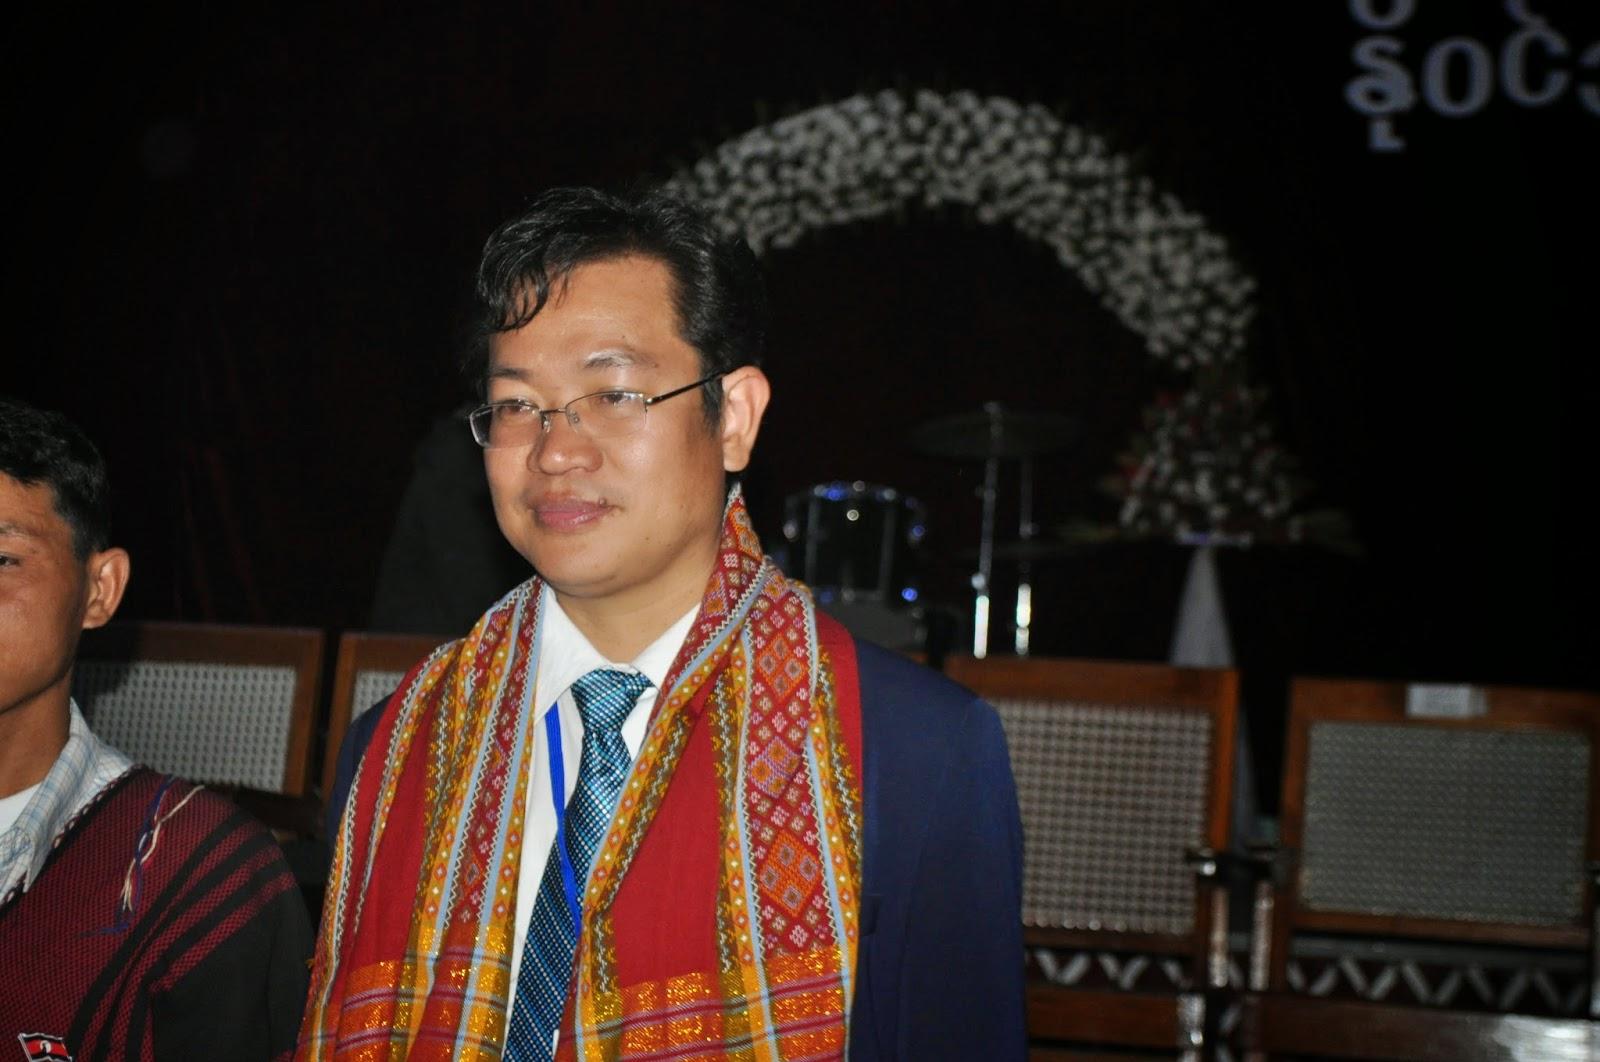 THE CHINLAND POST: Chin National Conference ah Palai Upa Cheukhat he Biaruahnak